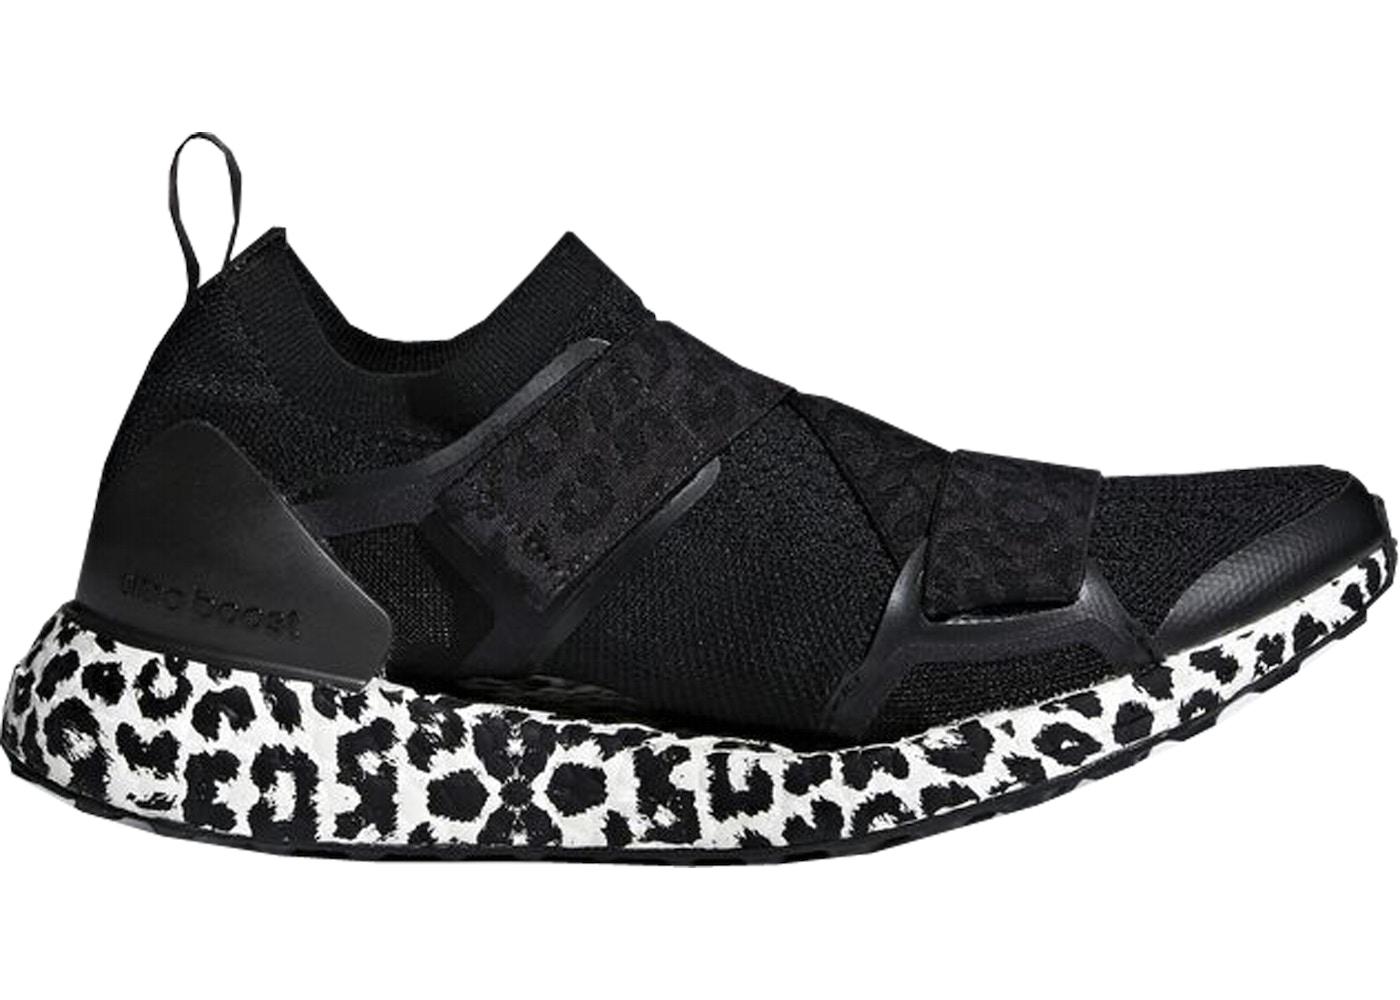 info for e6c23 ce3bd adidas Ultra Boost X Stella McCartney Black Leopard (W)